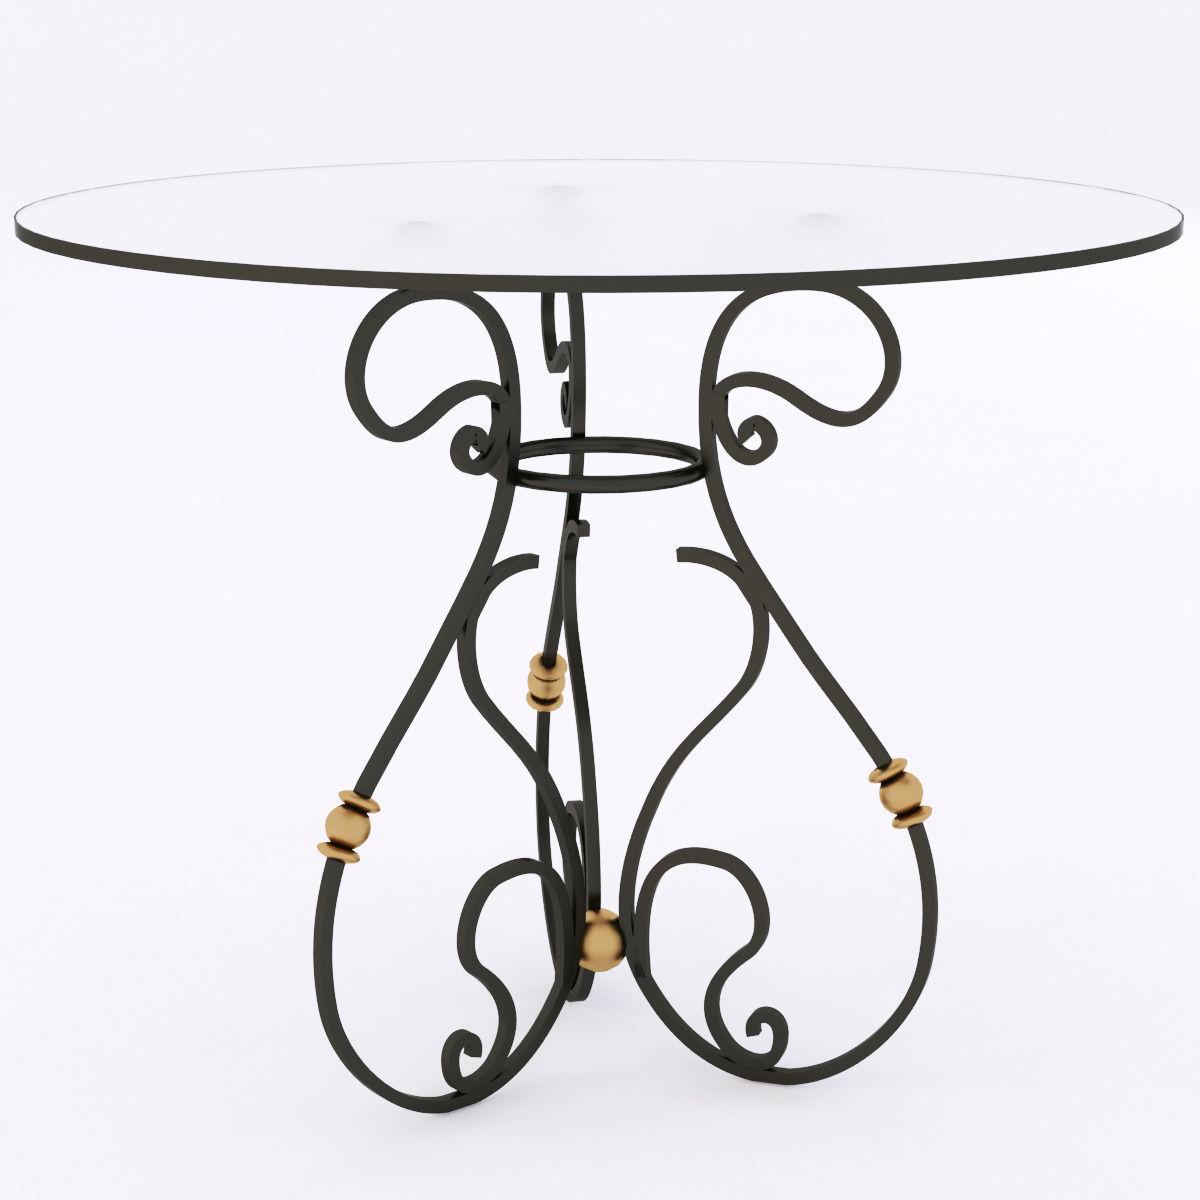 Wrought iron table 3d model max obj mtl 3ds fbx 1